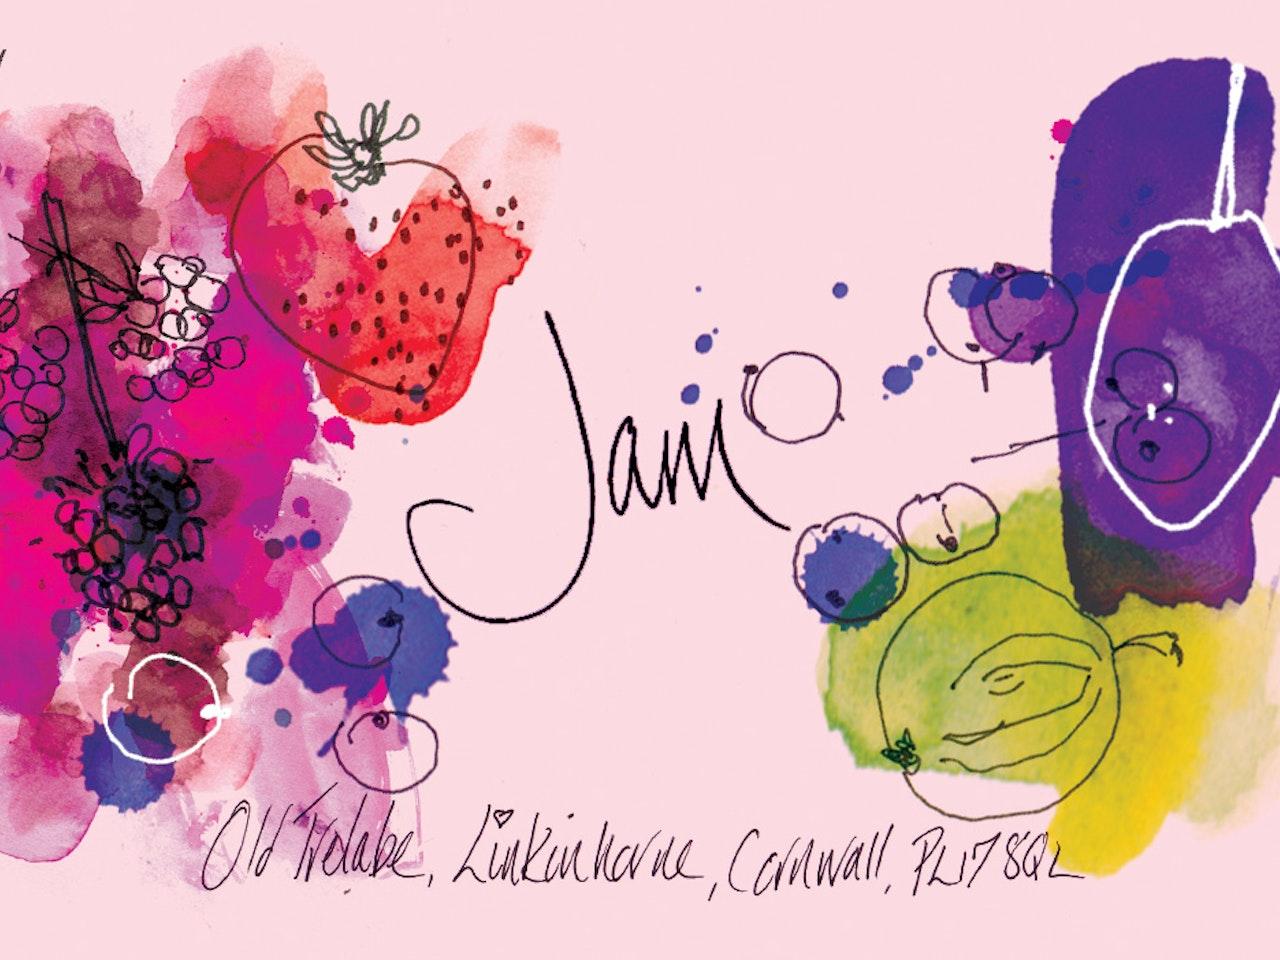 New Jam label!